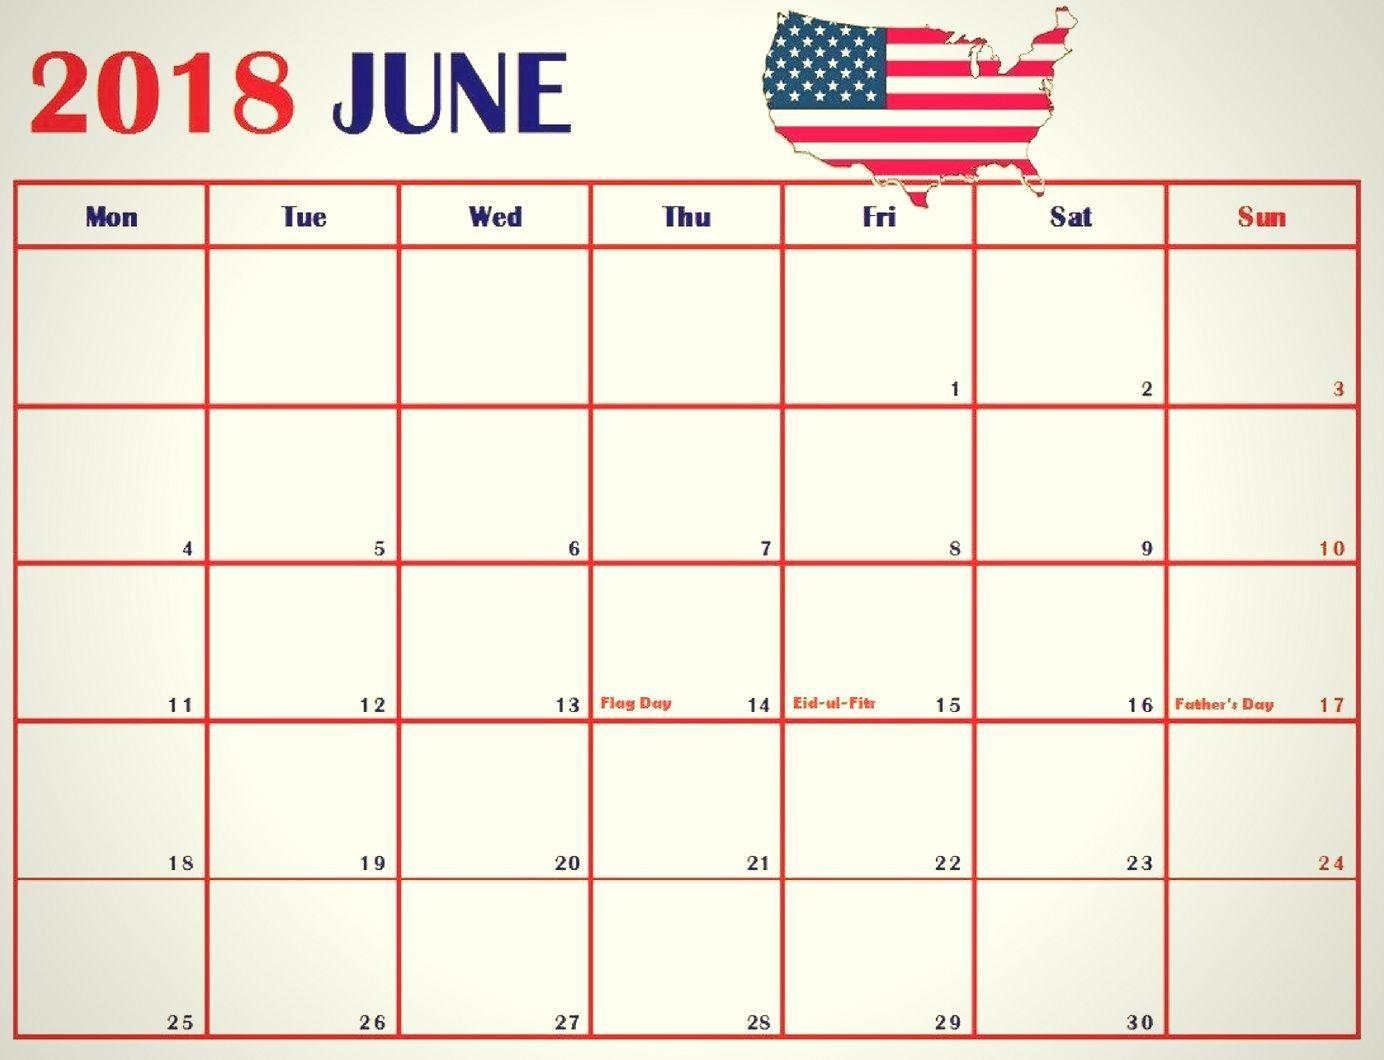 June 2018 Calendar USA Printable | Calendar, Calendar ...